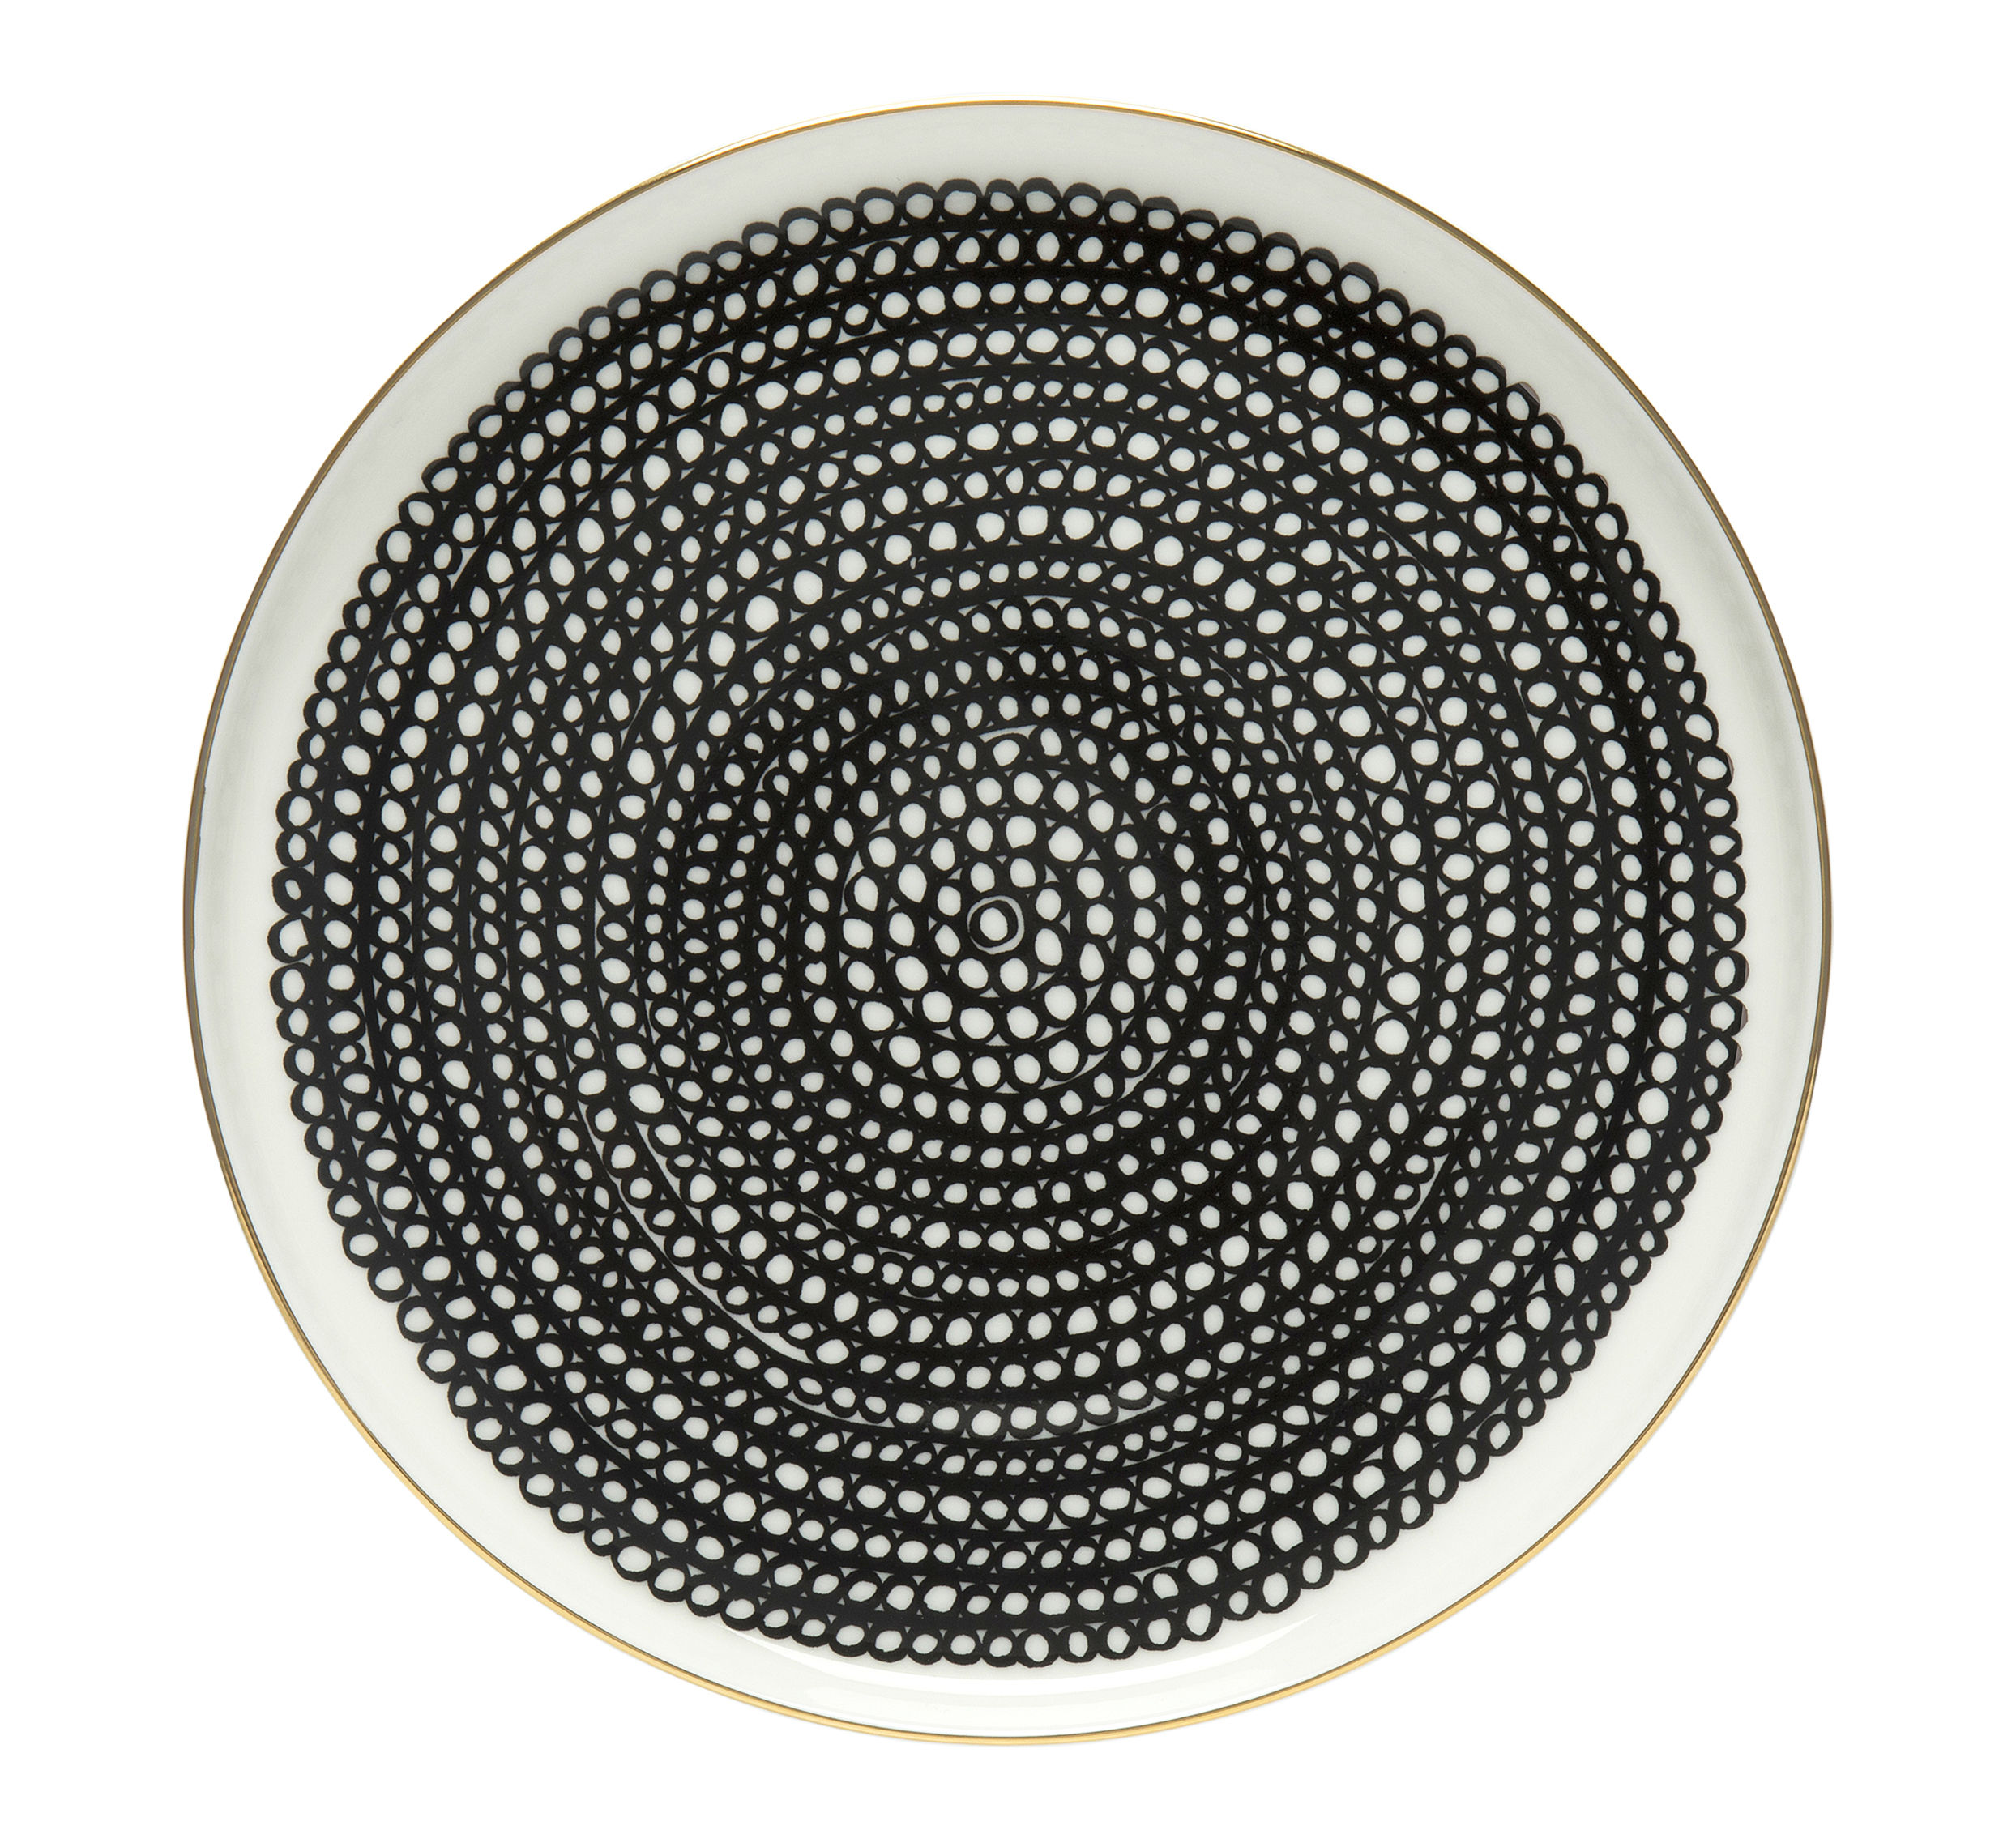 Arts de la table - Assiettes - Assiette à dessert Siirtolapuutarha / Ø 20 cm - Edition 10ème anniversaire - Marimekko - Siirtolapuutarha / Or, noir & blanc - Grès